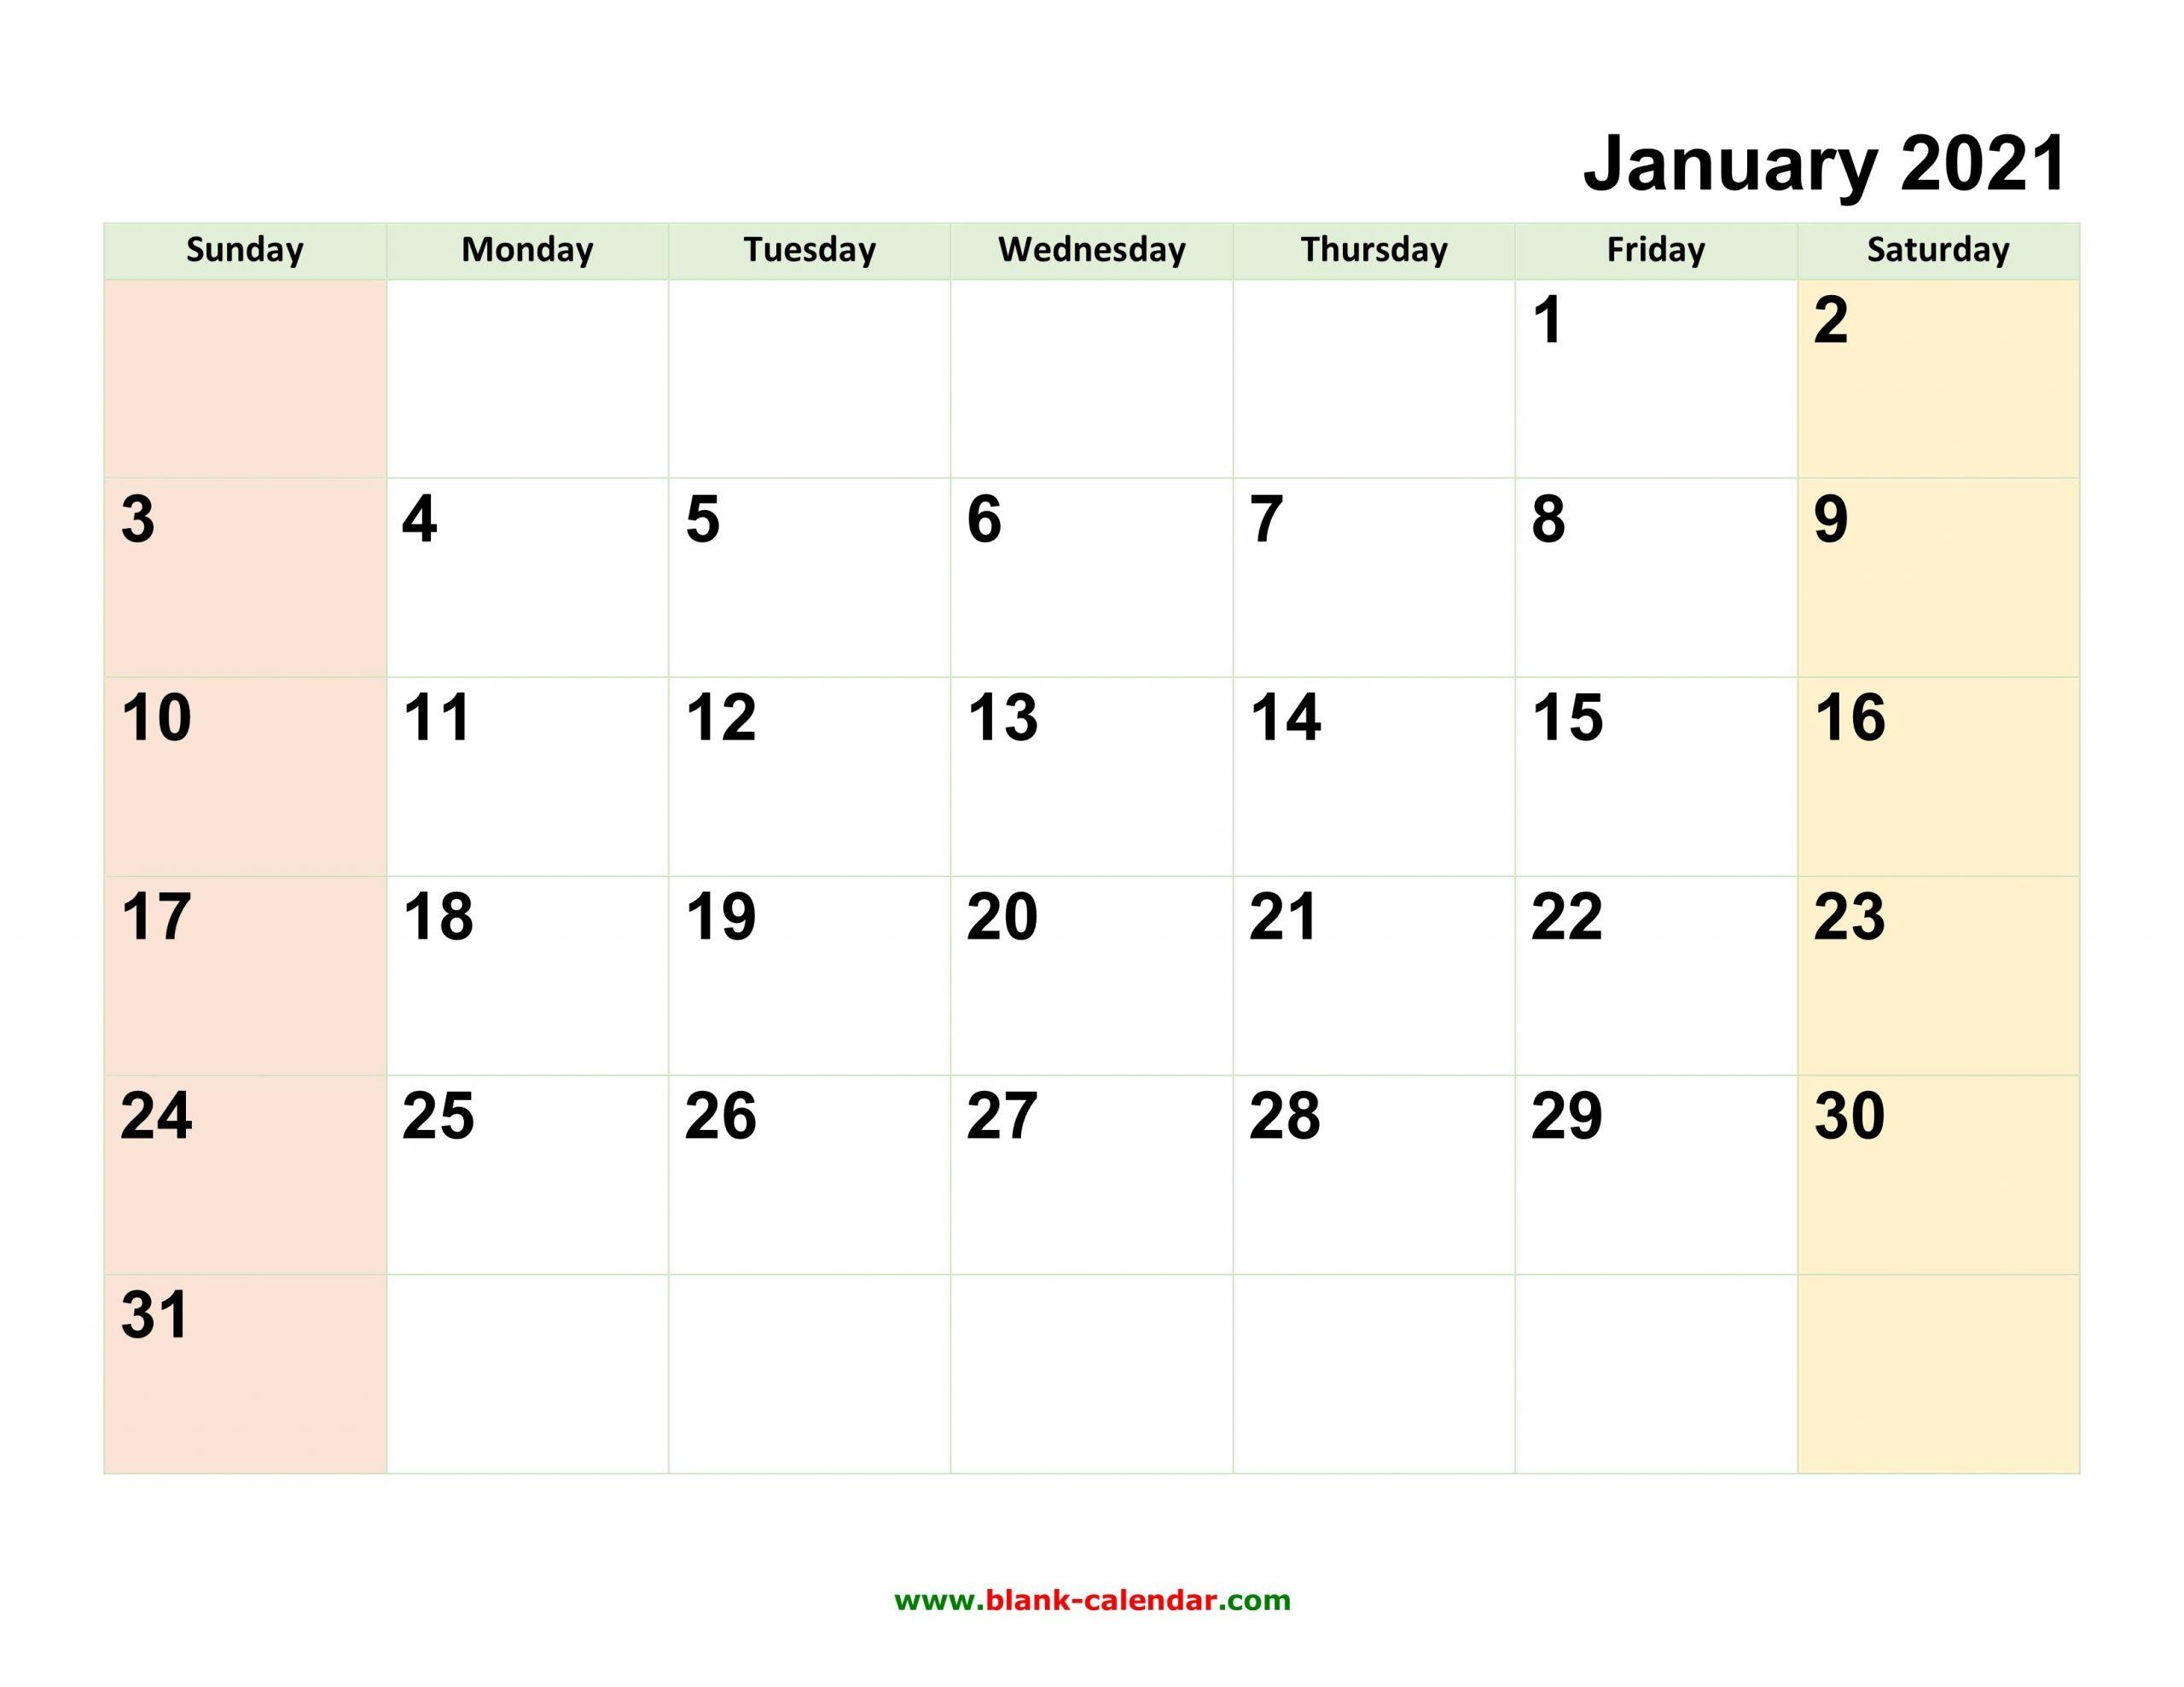 Monthly Calendar 2021 | Free Download, Editable And Printable-Microsoft Printable Calendars 2021